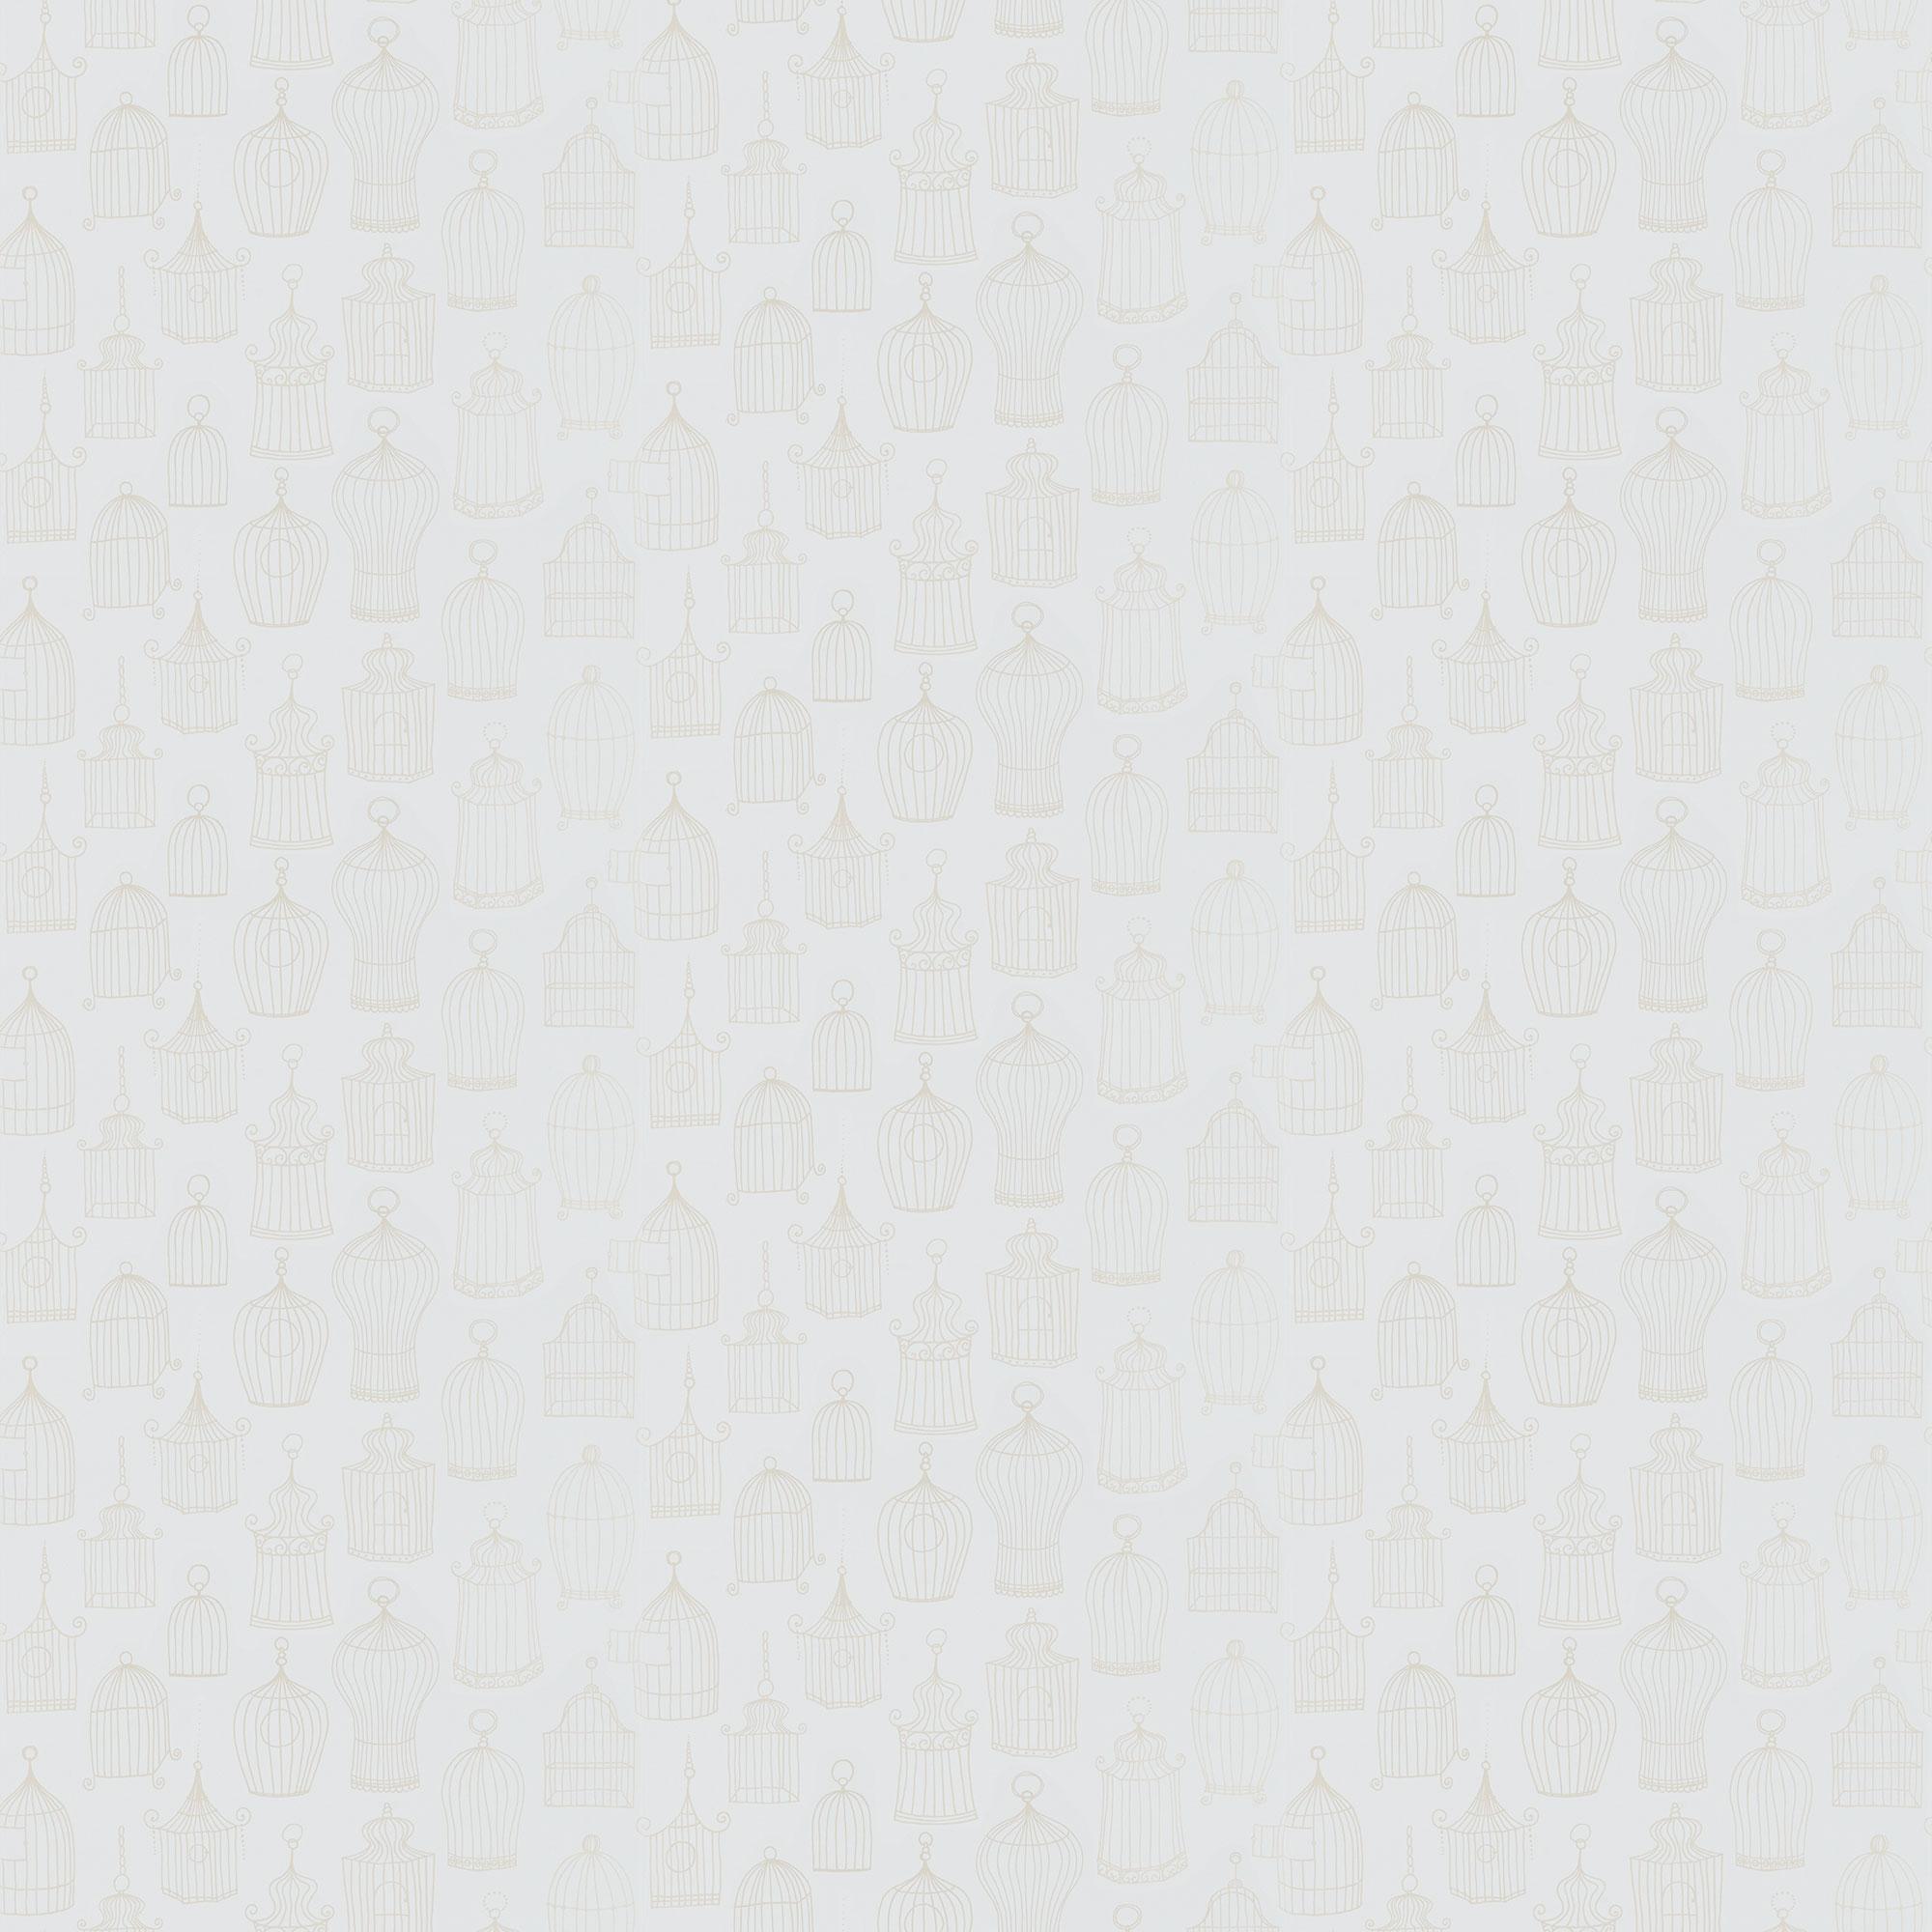 Шведские обои Sandberg,  коллекция Engla & Elliot, артикул781-12